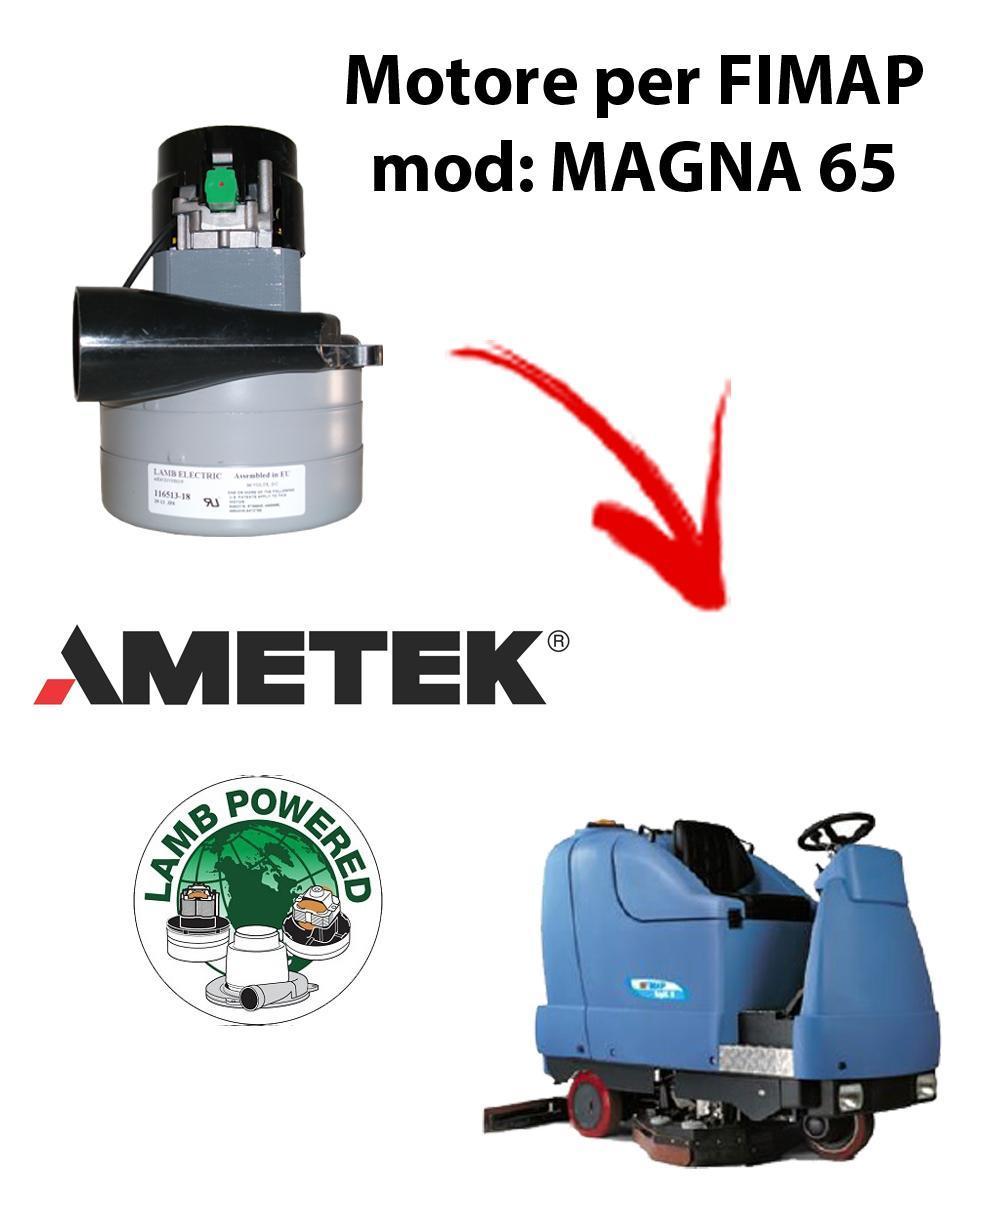 MAGNA 65  Ametek Vacuum Motor for scrubber dryer Fimap